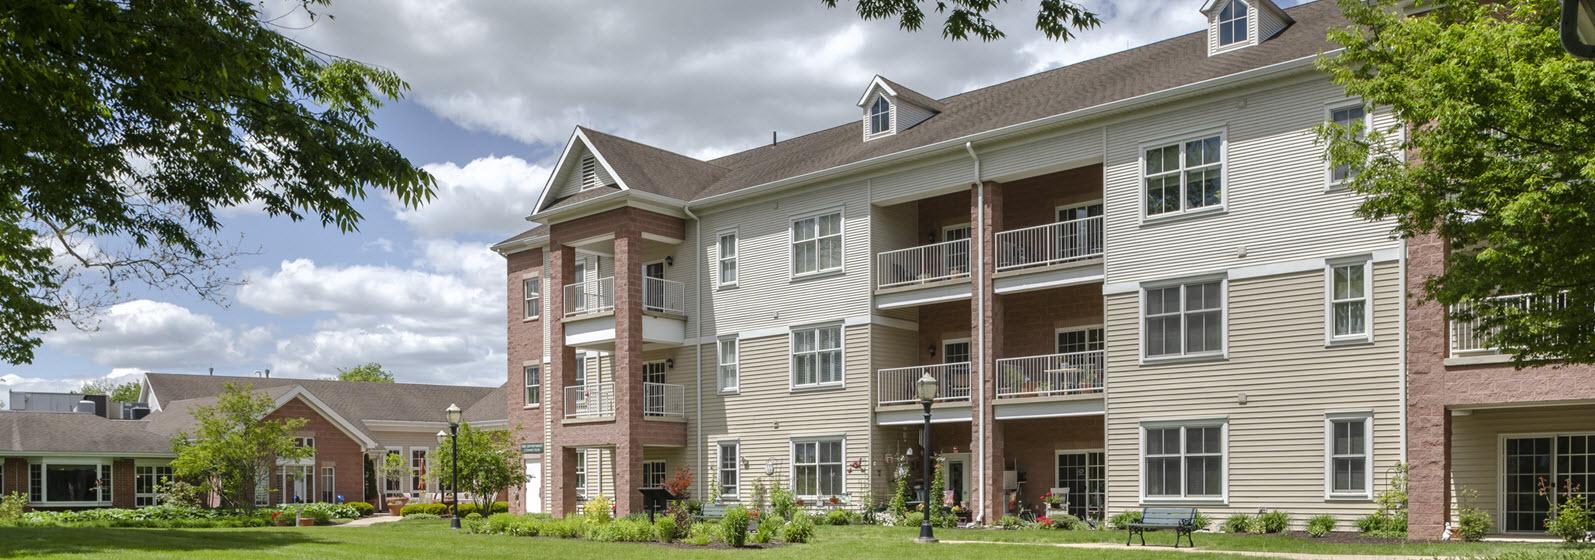 independent senior apartments lewisburg pa